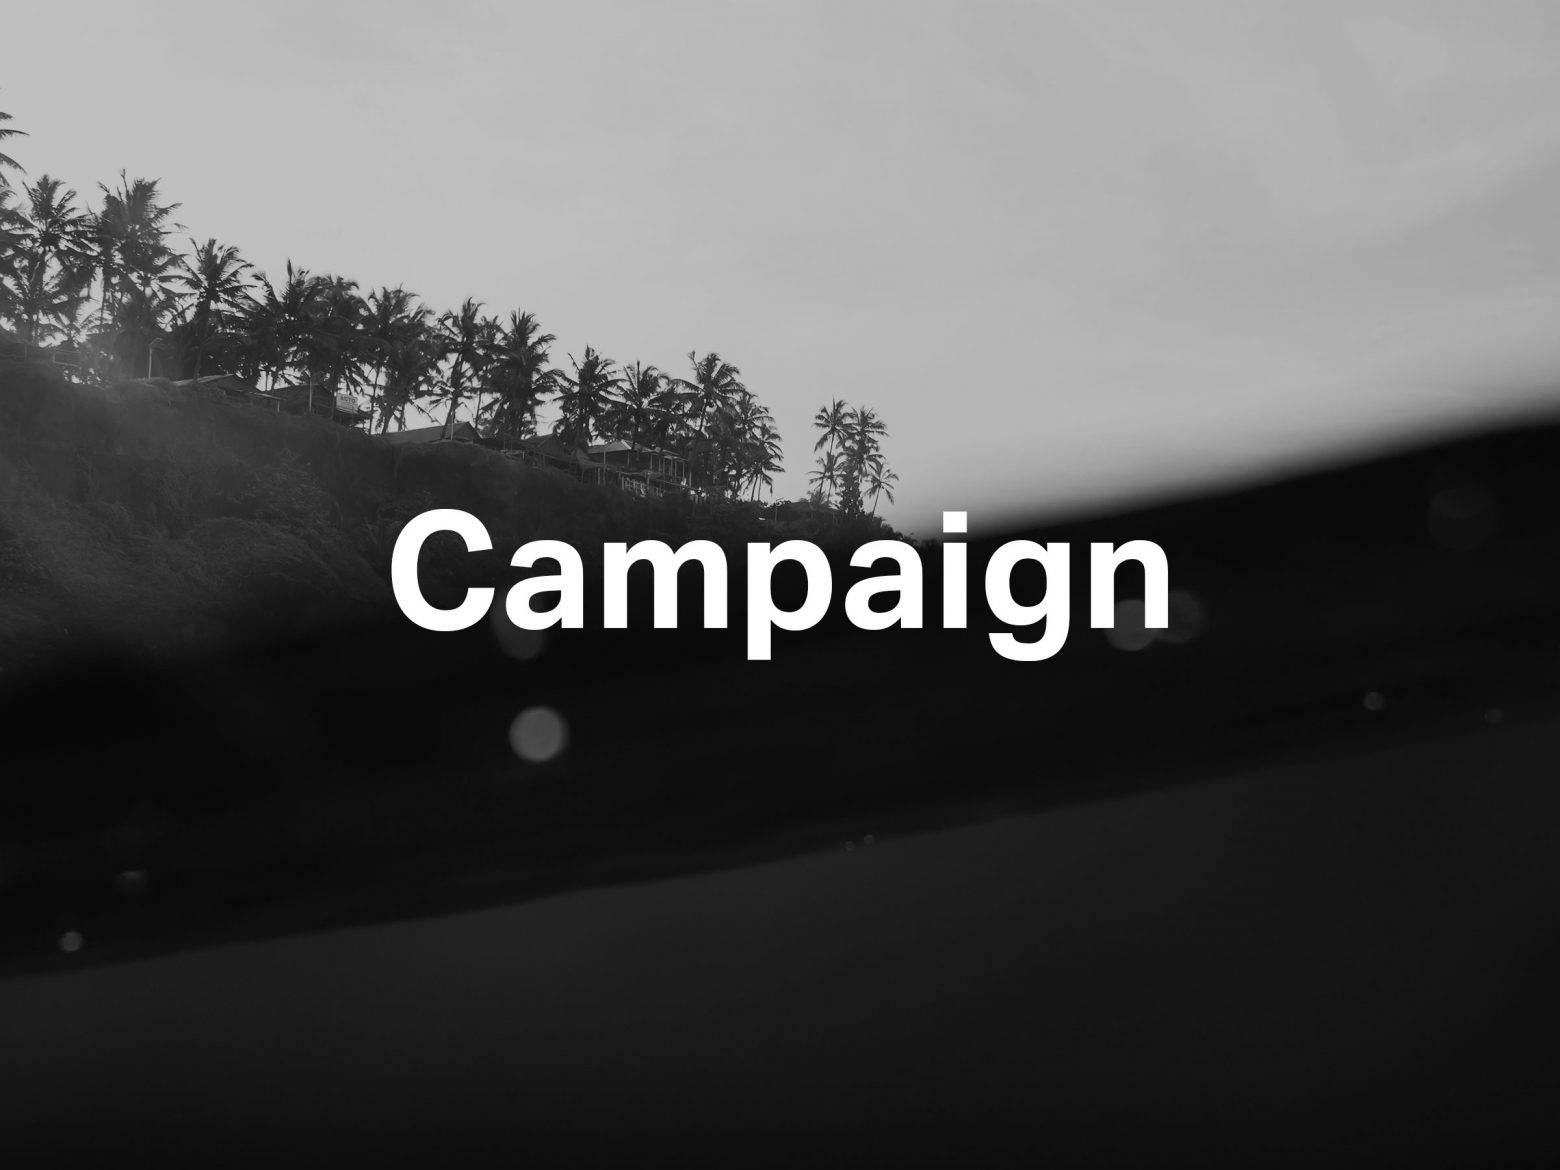 https://www.soulandsurf.com/wp-content/uploads/2021/08/climate-action-plan-S_S-Campaign-e1628350256916.jpg Image